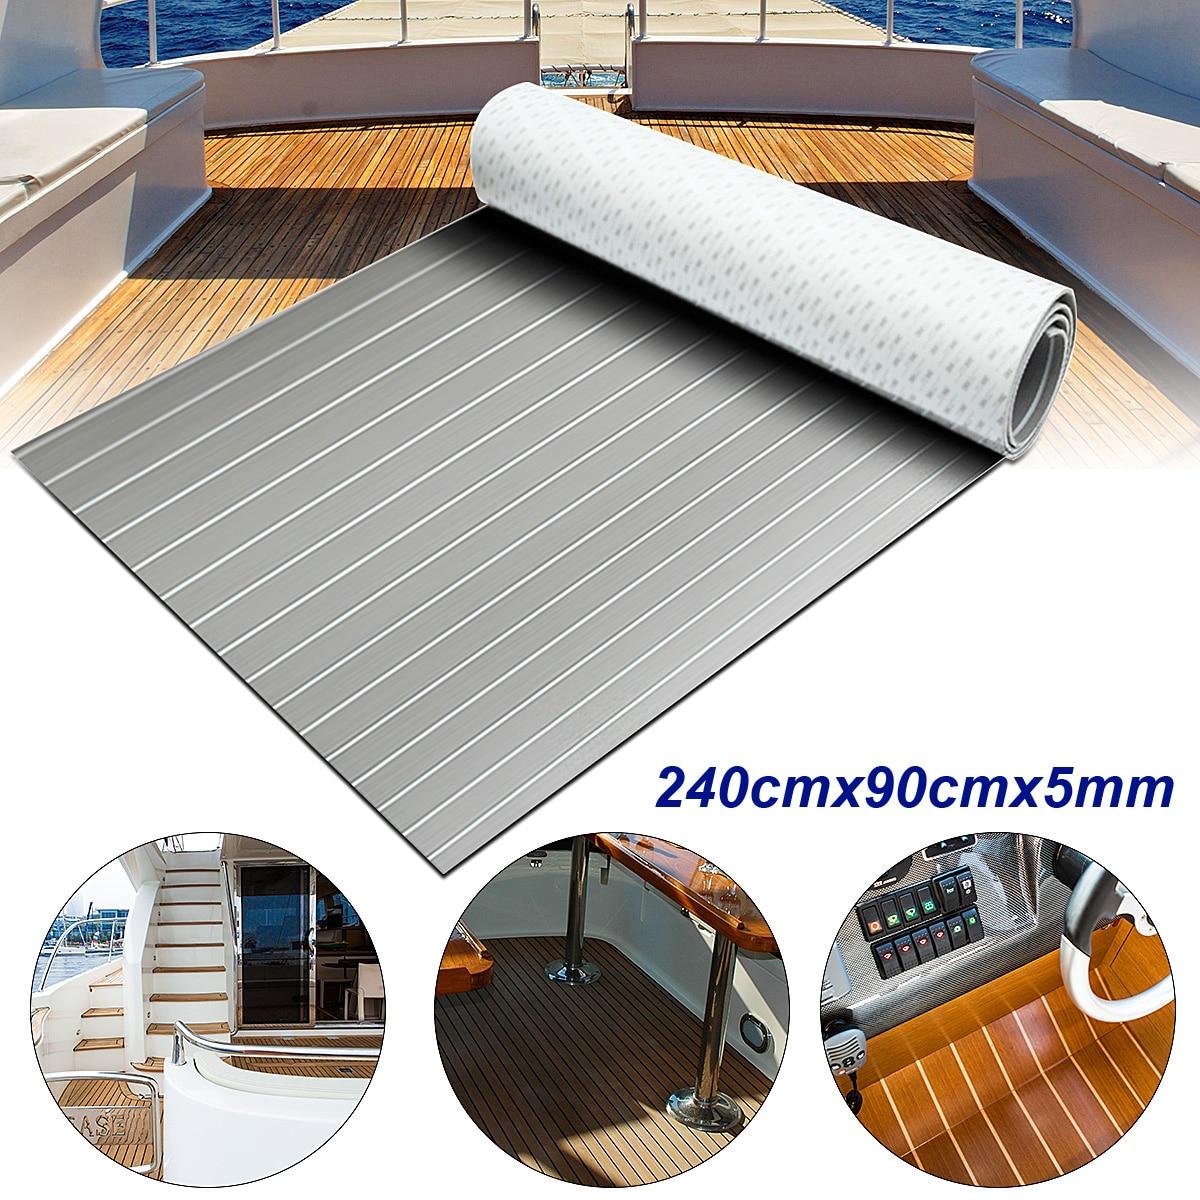 Self-Adhesive 240cmx90cmx5mm Teak Decking EVA Foam Marine Flooring Faux Grey White Lines EVA Foam Boat Decking Sheet Accessories